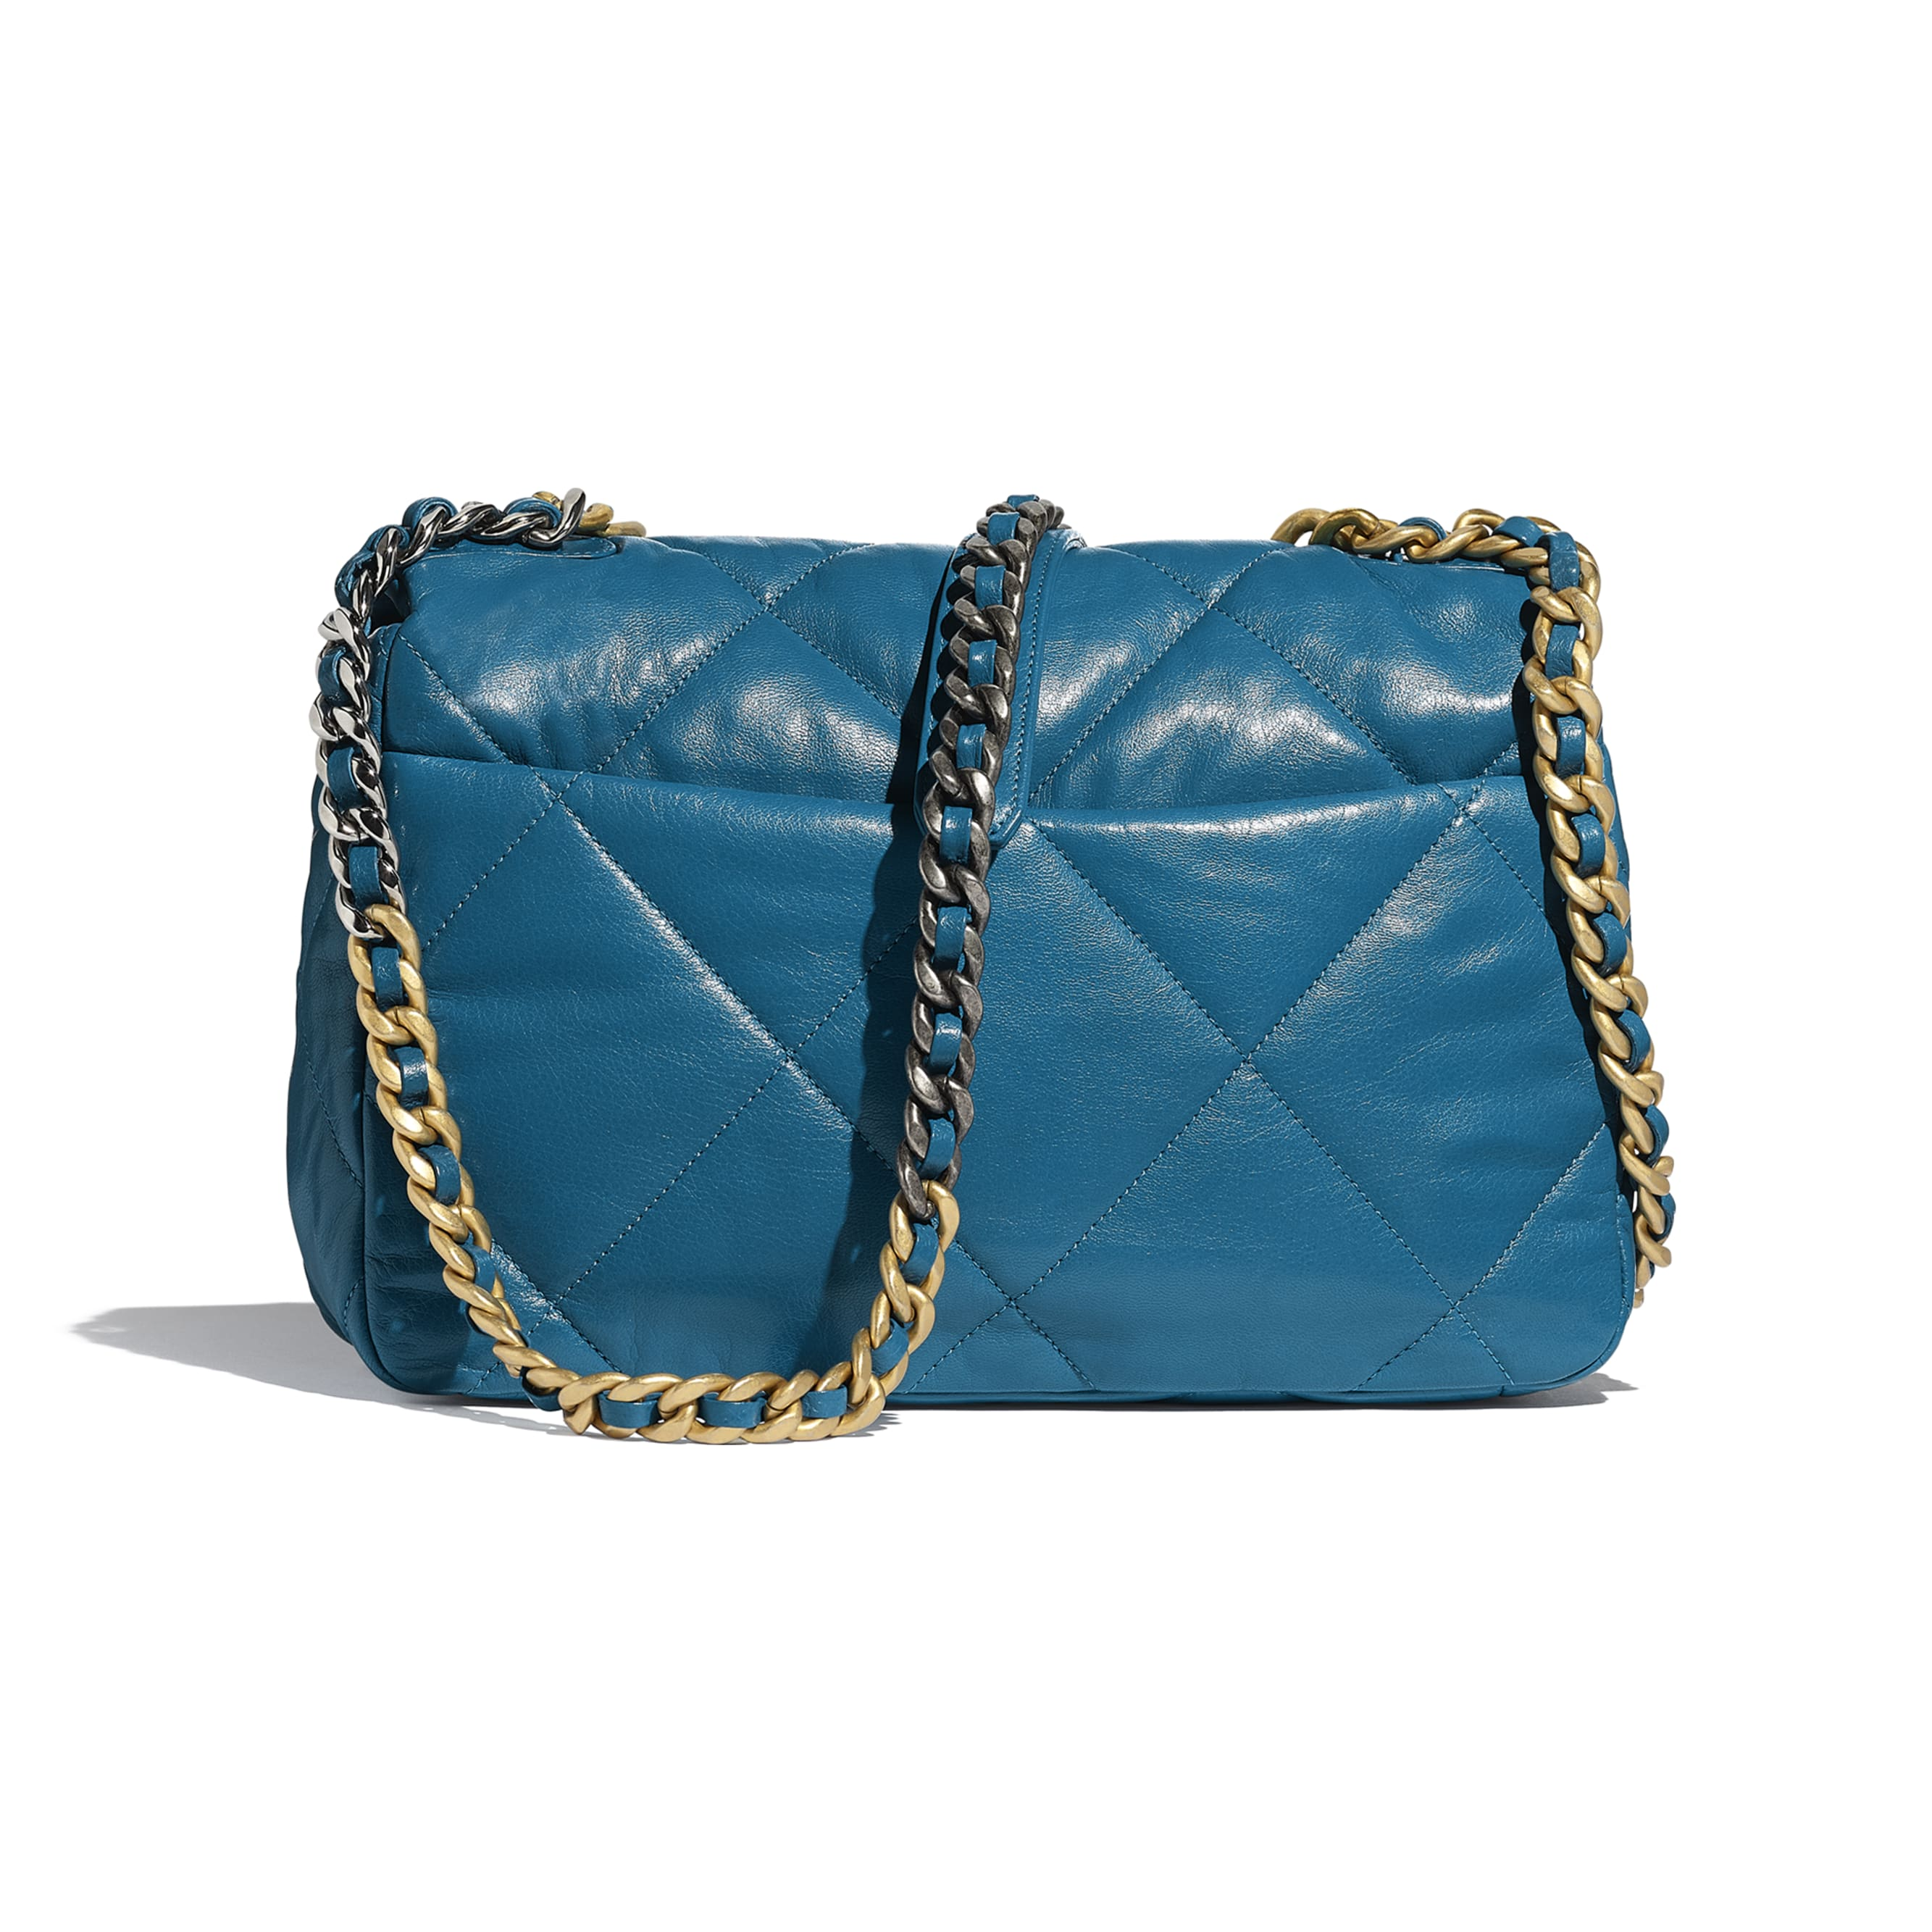 CHANEL 19 Large Flap Bag - Turquoise - Goatskin, Gold-Tone, Silver-Tone & Ruthenium-Finish Metal - Alternative view - see standard sized version